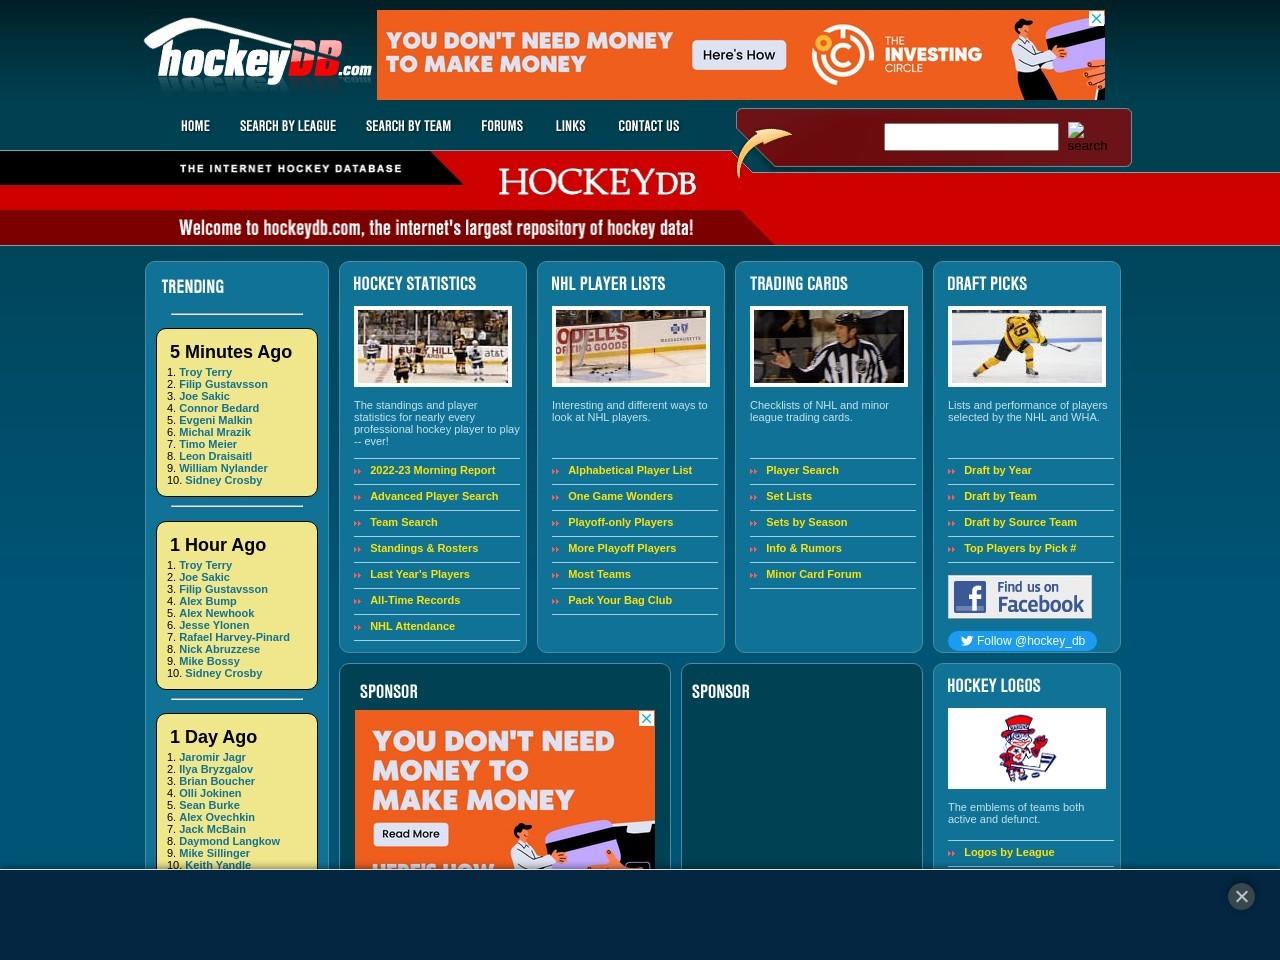 hockeydb.com